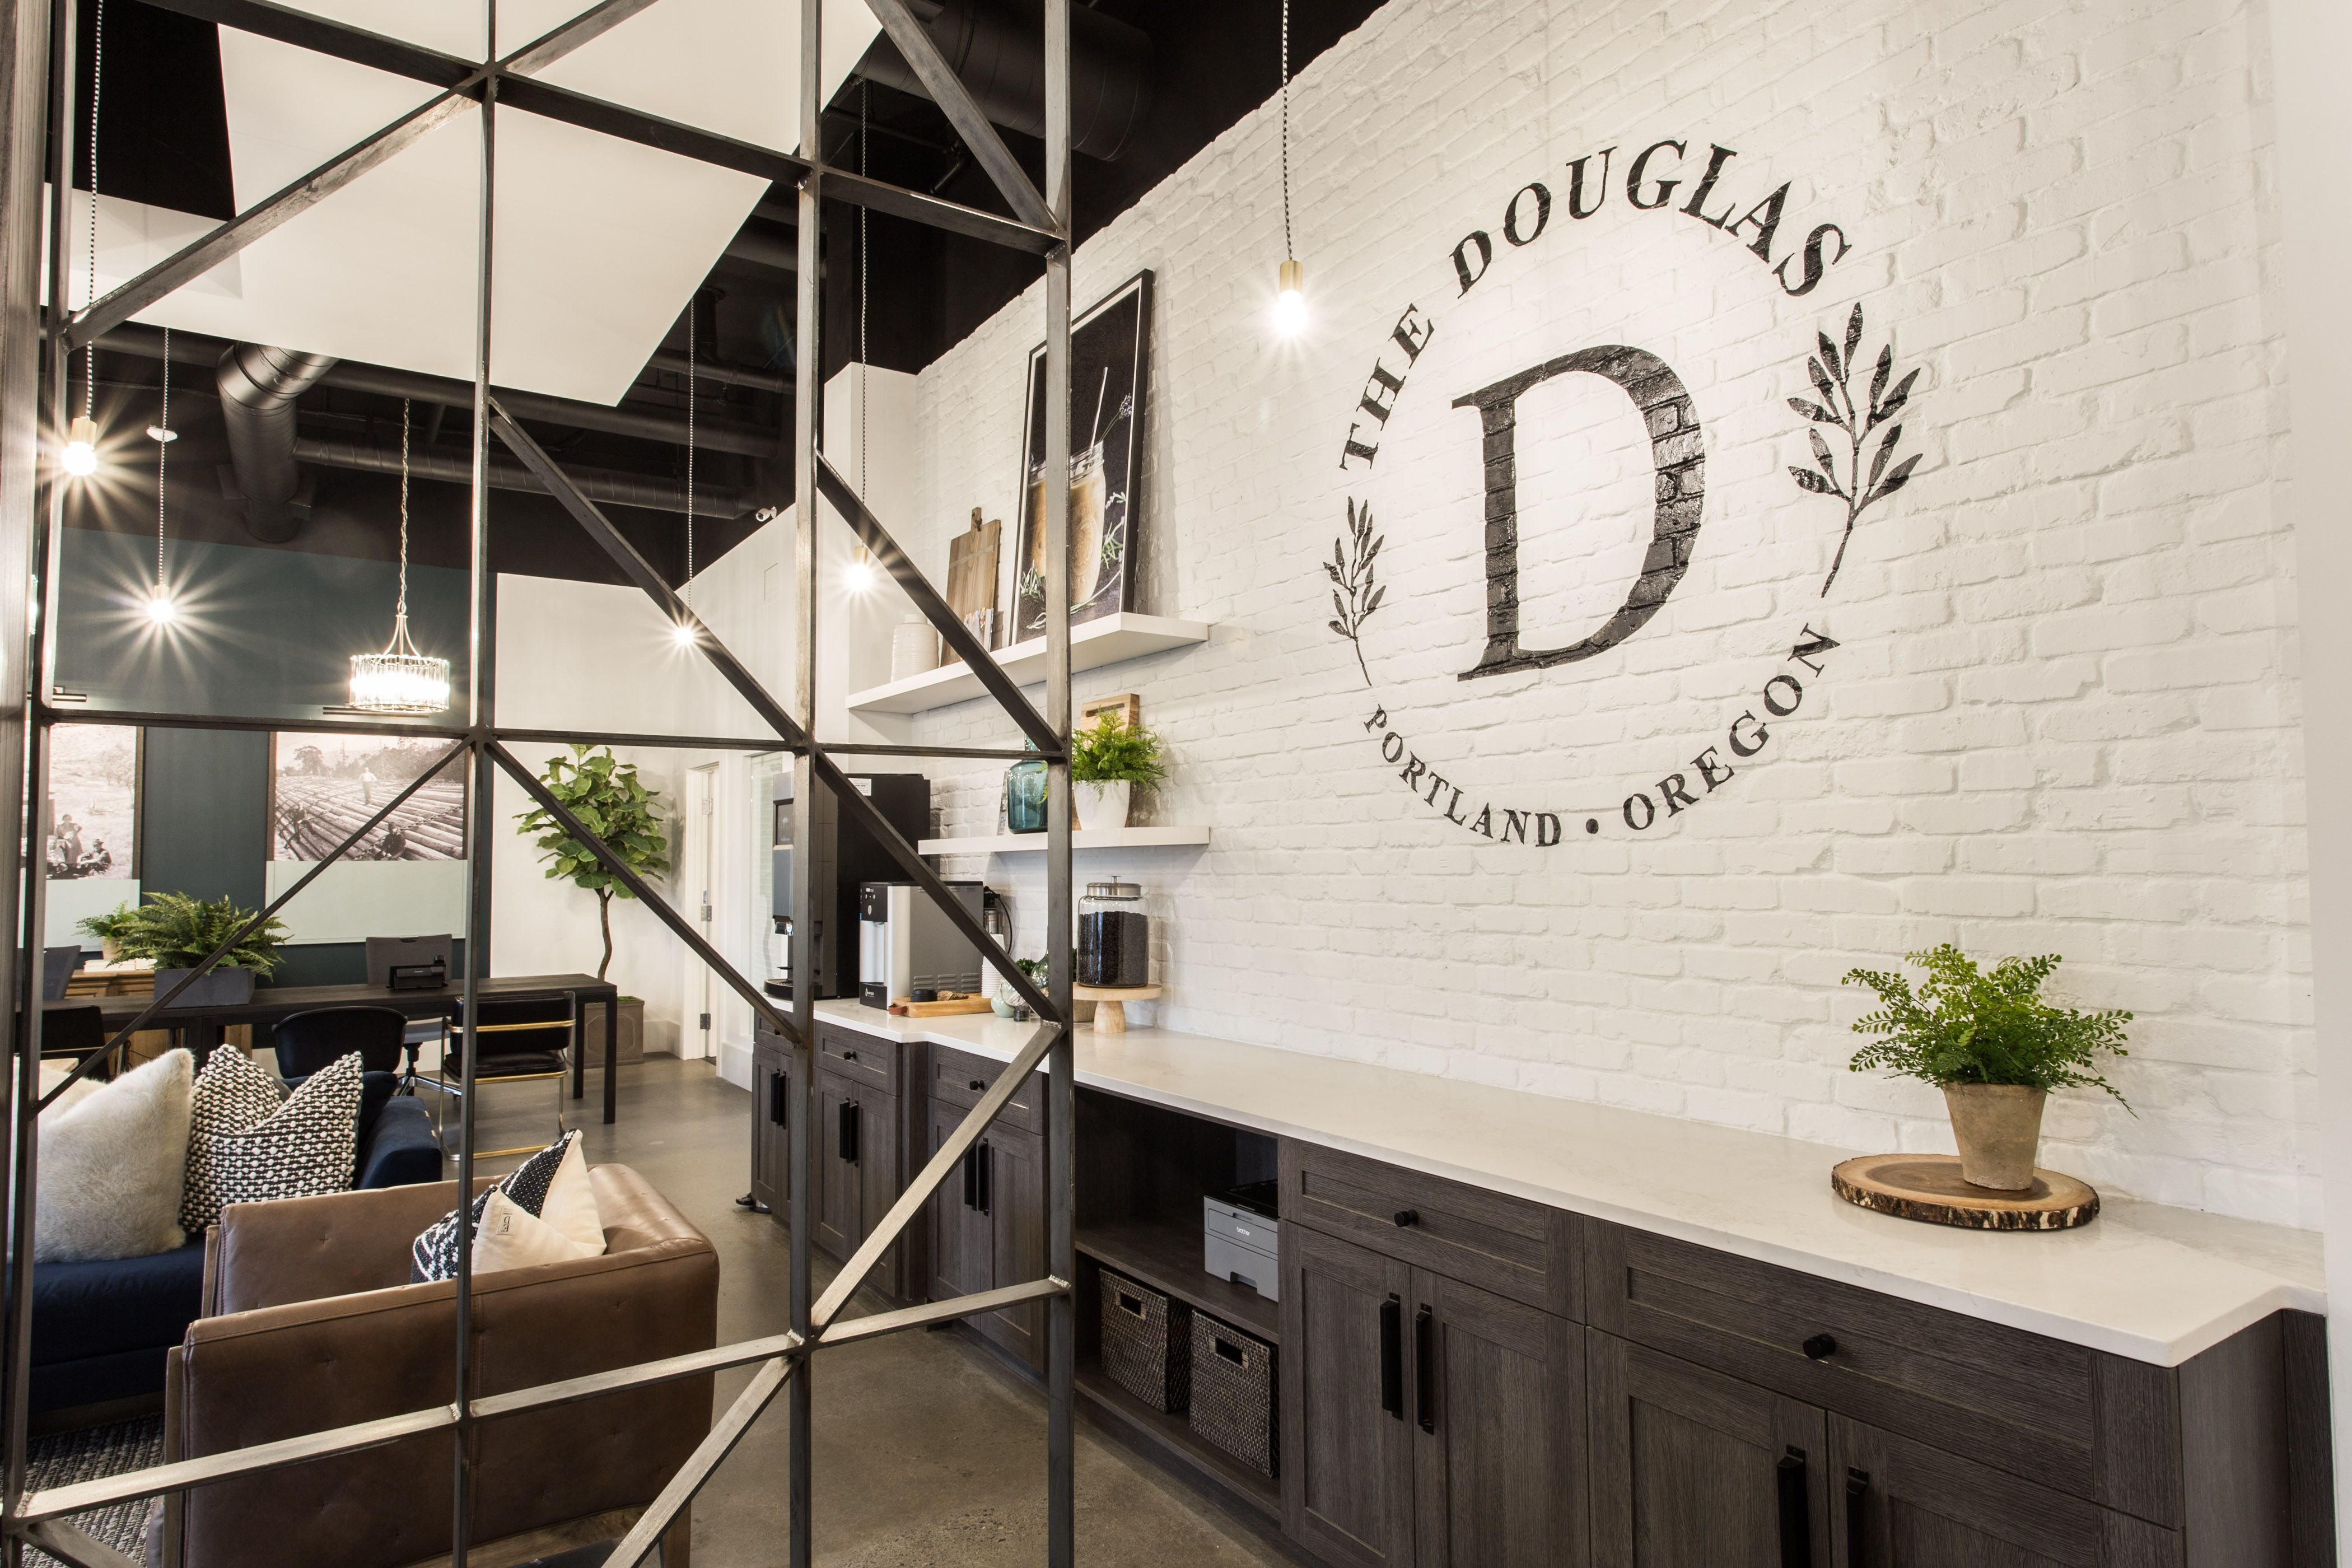 The Douglas CID Multifamily & Hospitality Interior